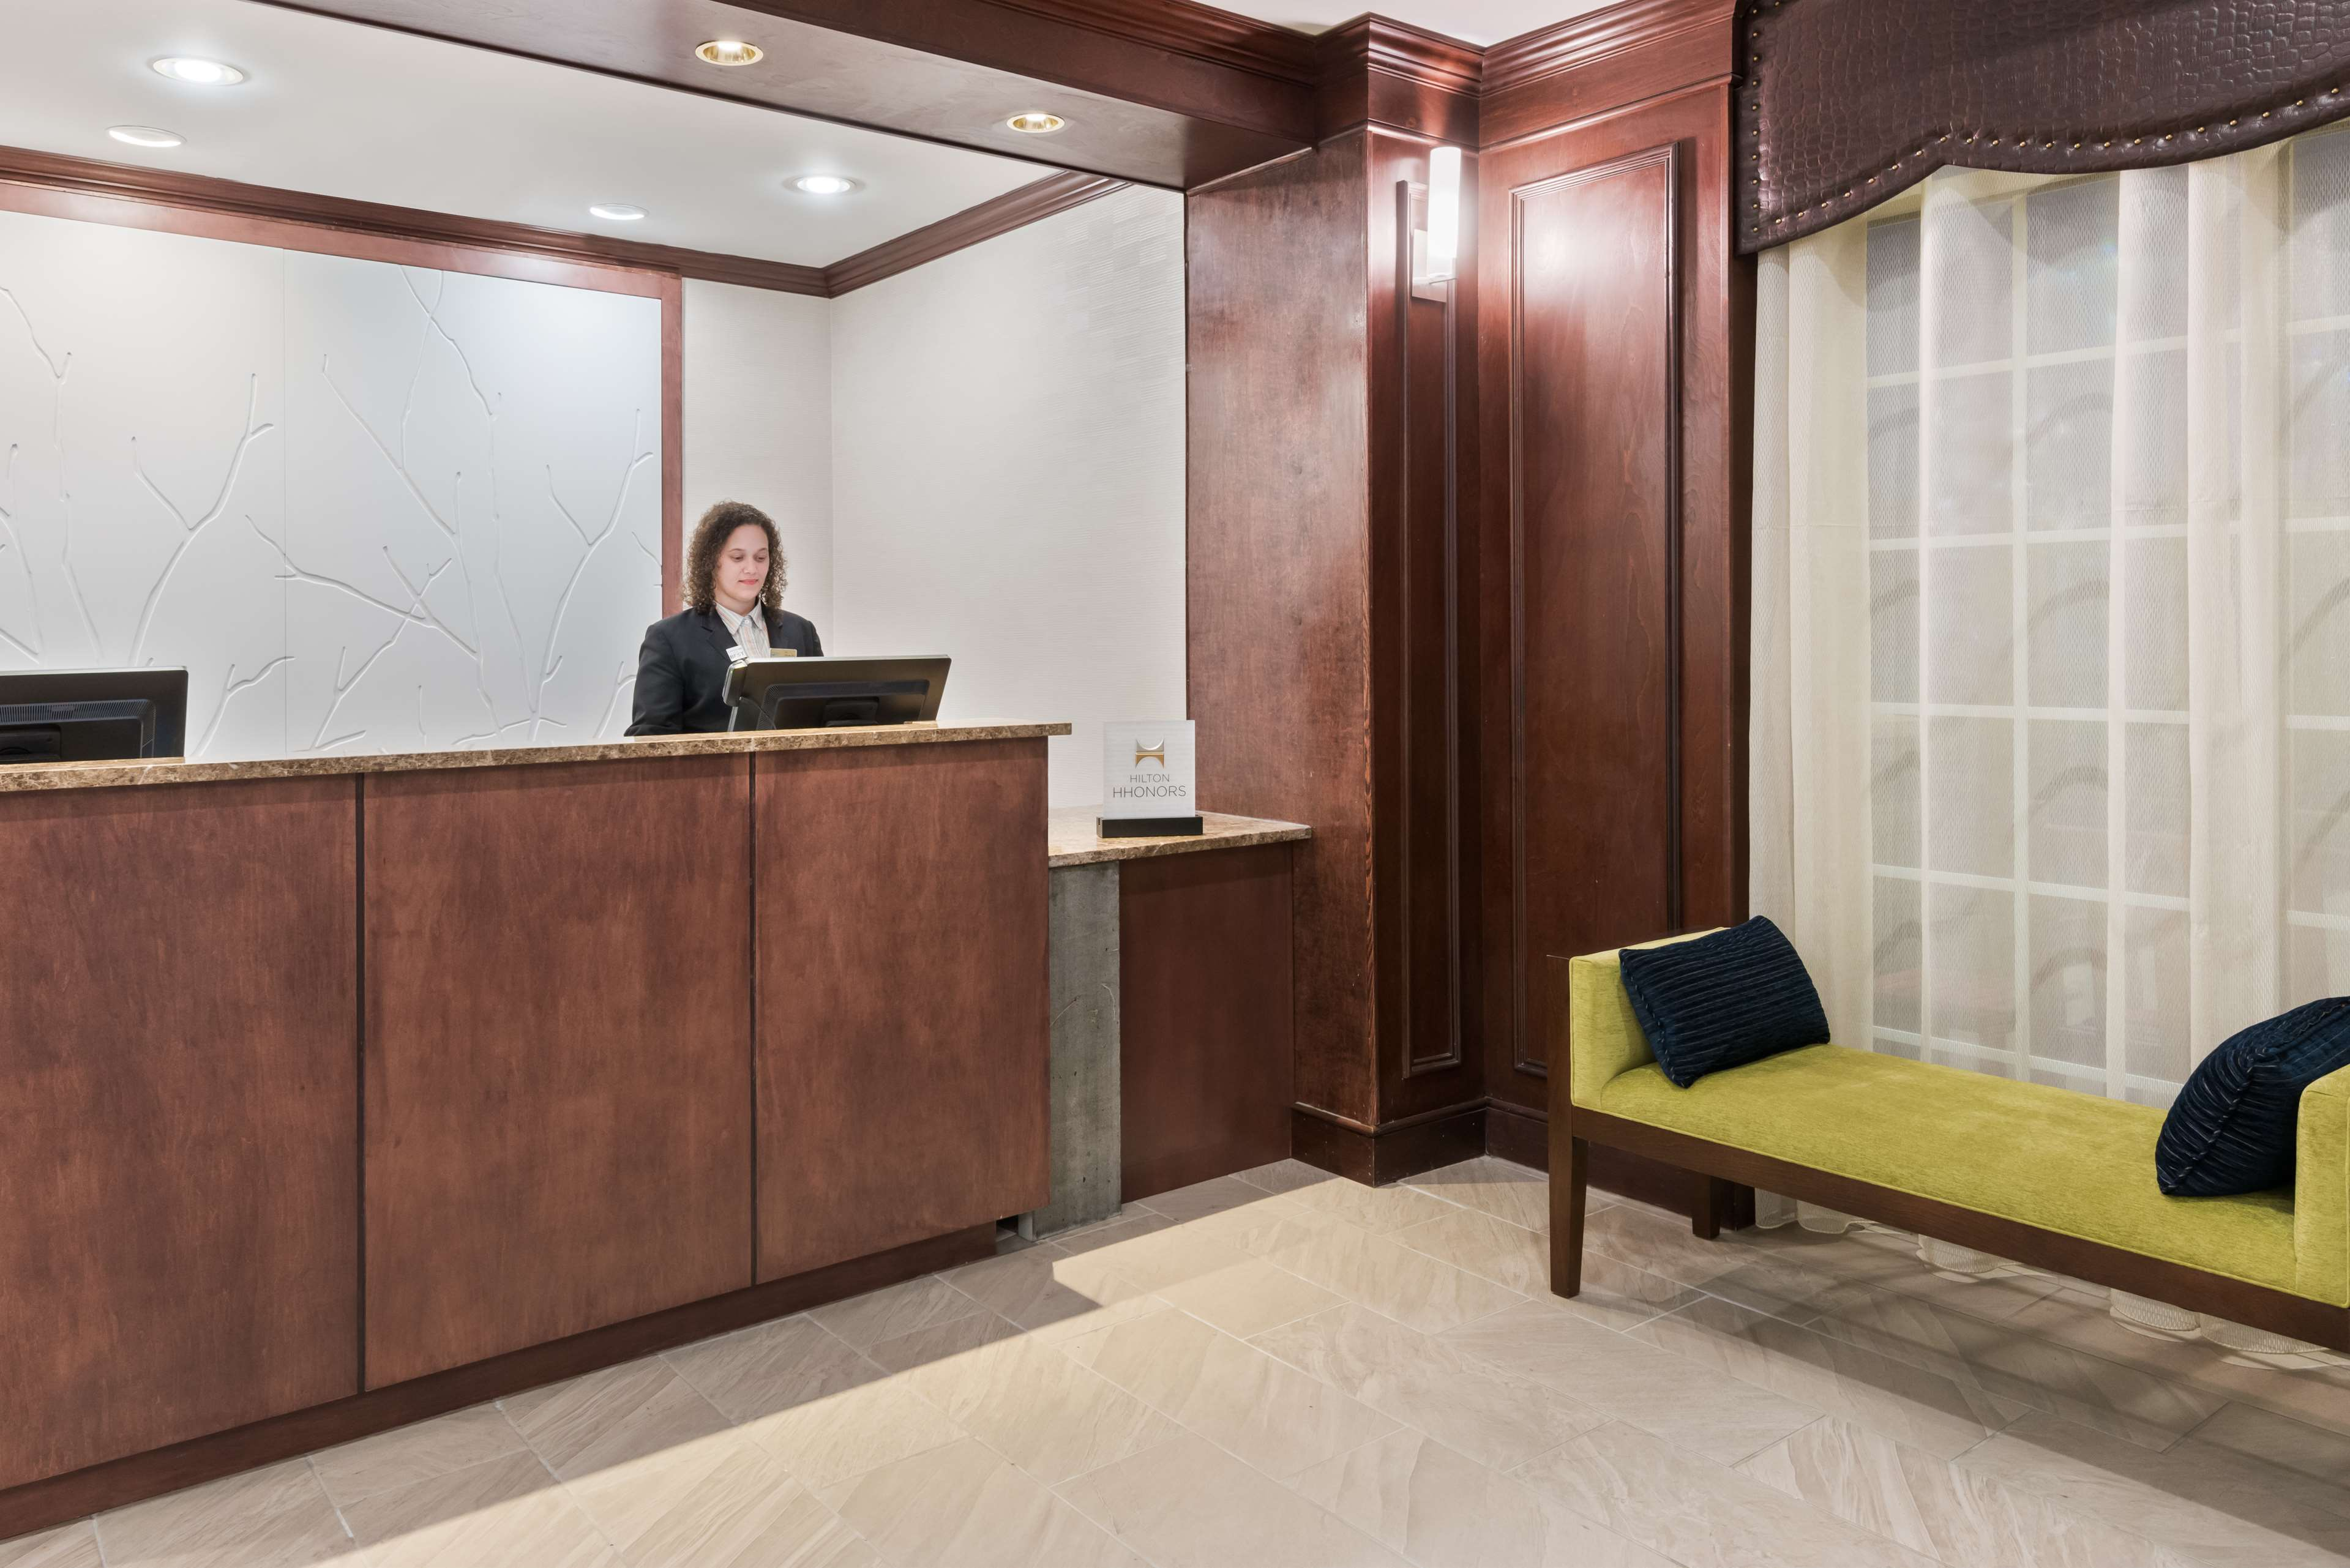 Homewood Suites by Hilton Holyoke-Springfield/North image 4